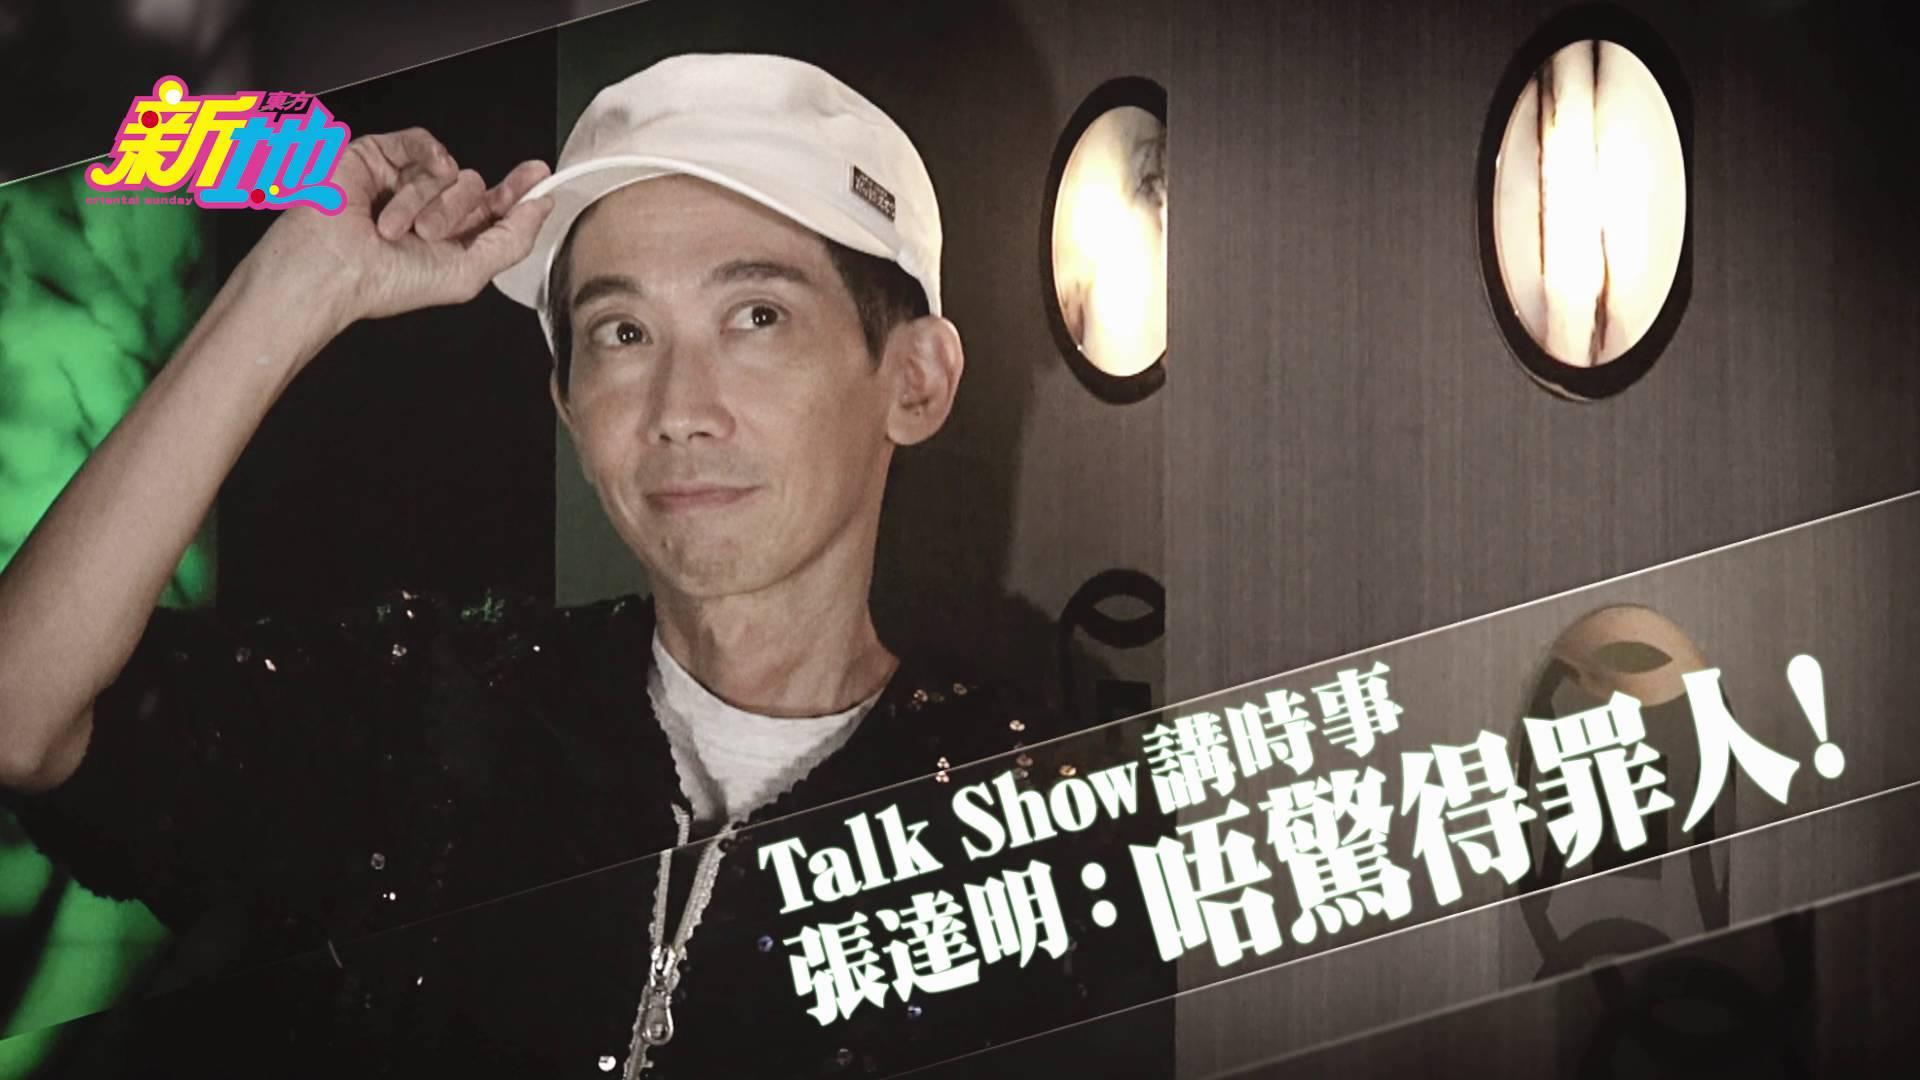 Talk Show講時事 張達明:唔驚得罪人!  東方新地